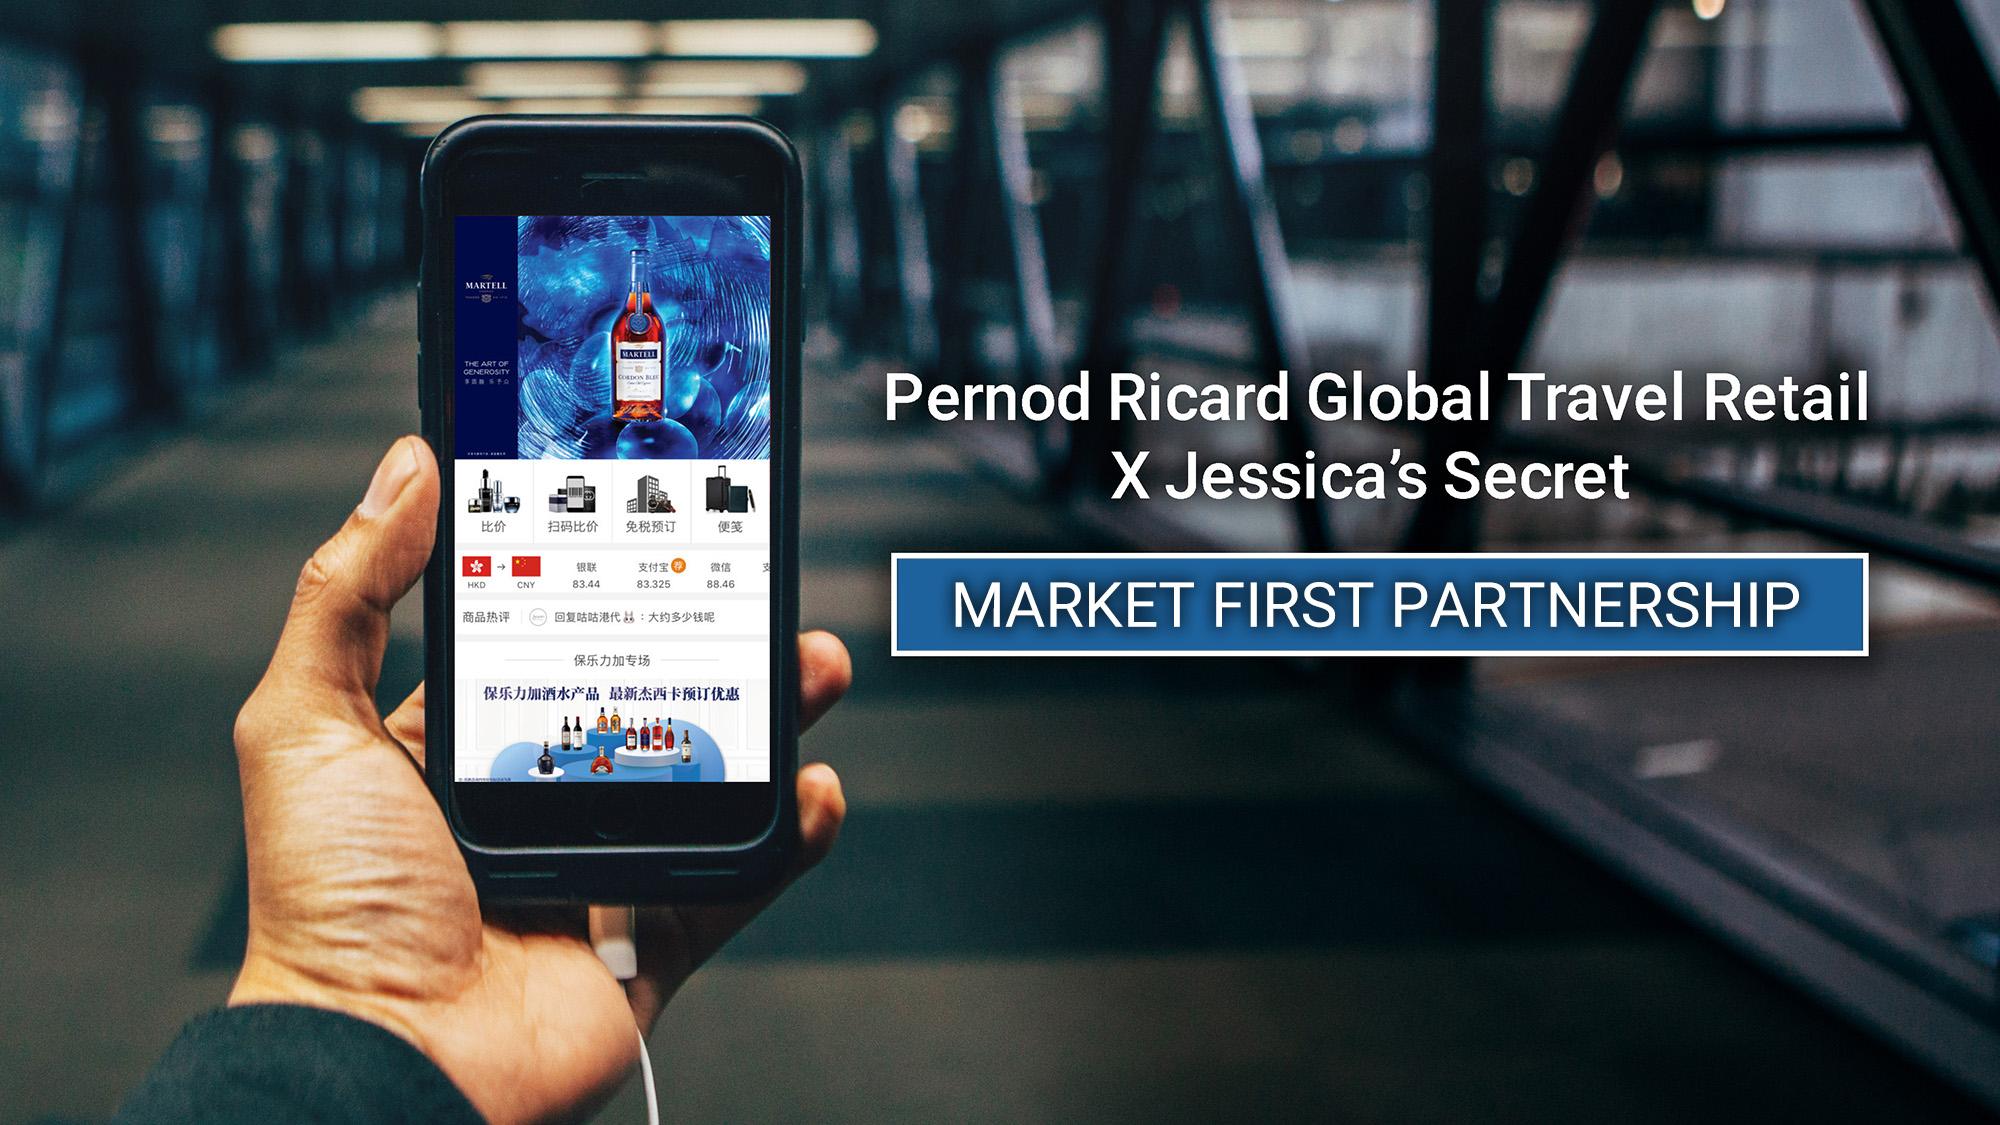 Pernod Ricard x Jessica's Secret-editorial image1